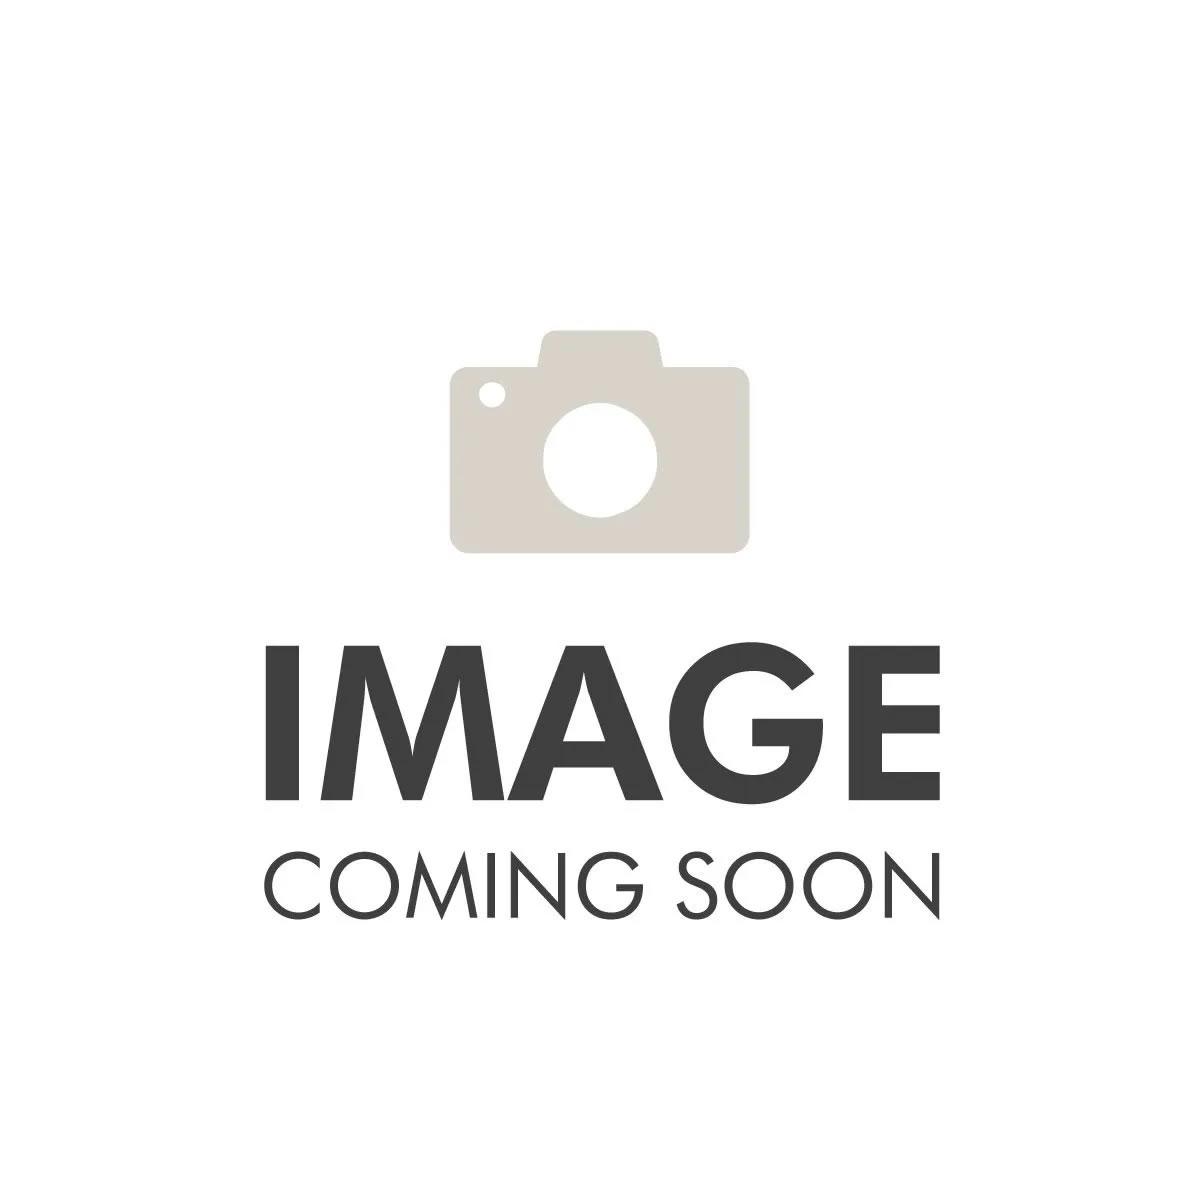 Fabric Rear Seat Covers Tan; 80-95 Jeep CJ/Wrangler YJ